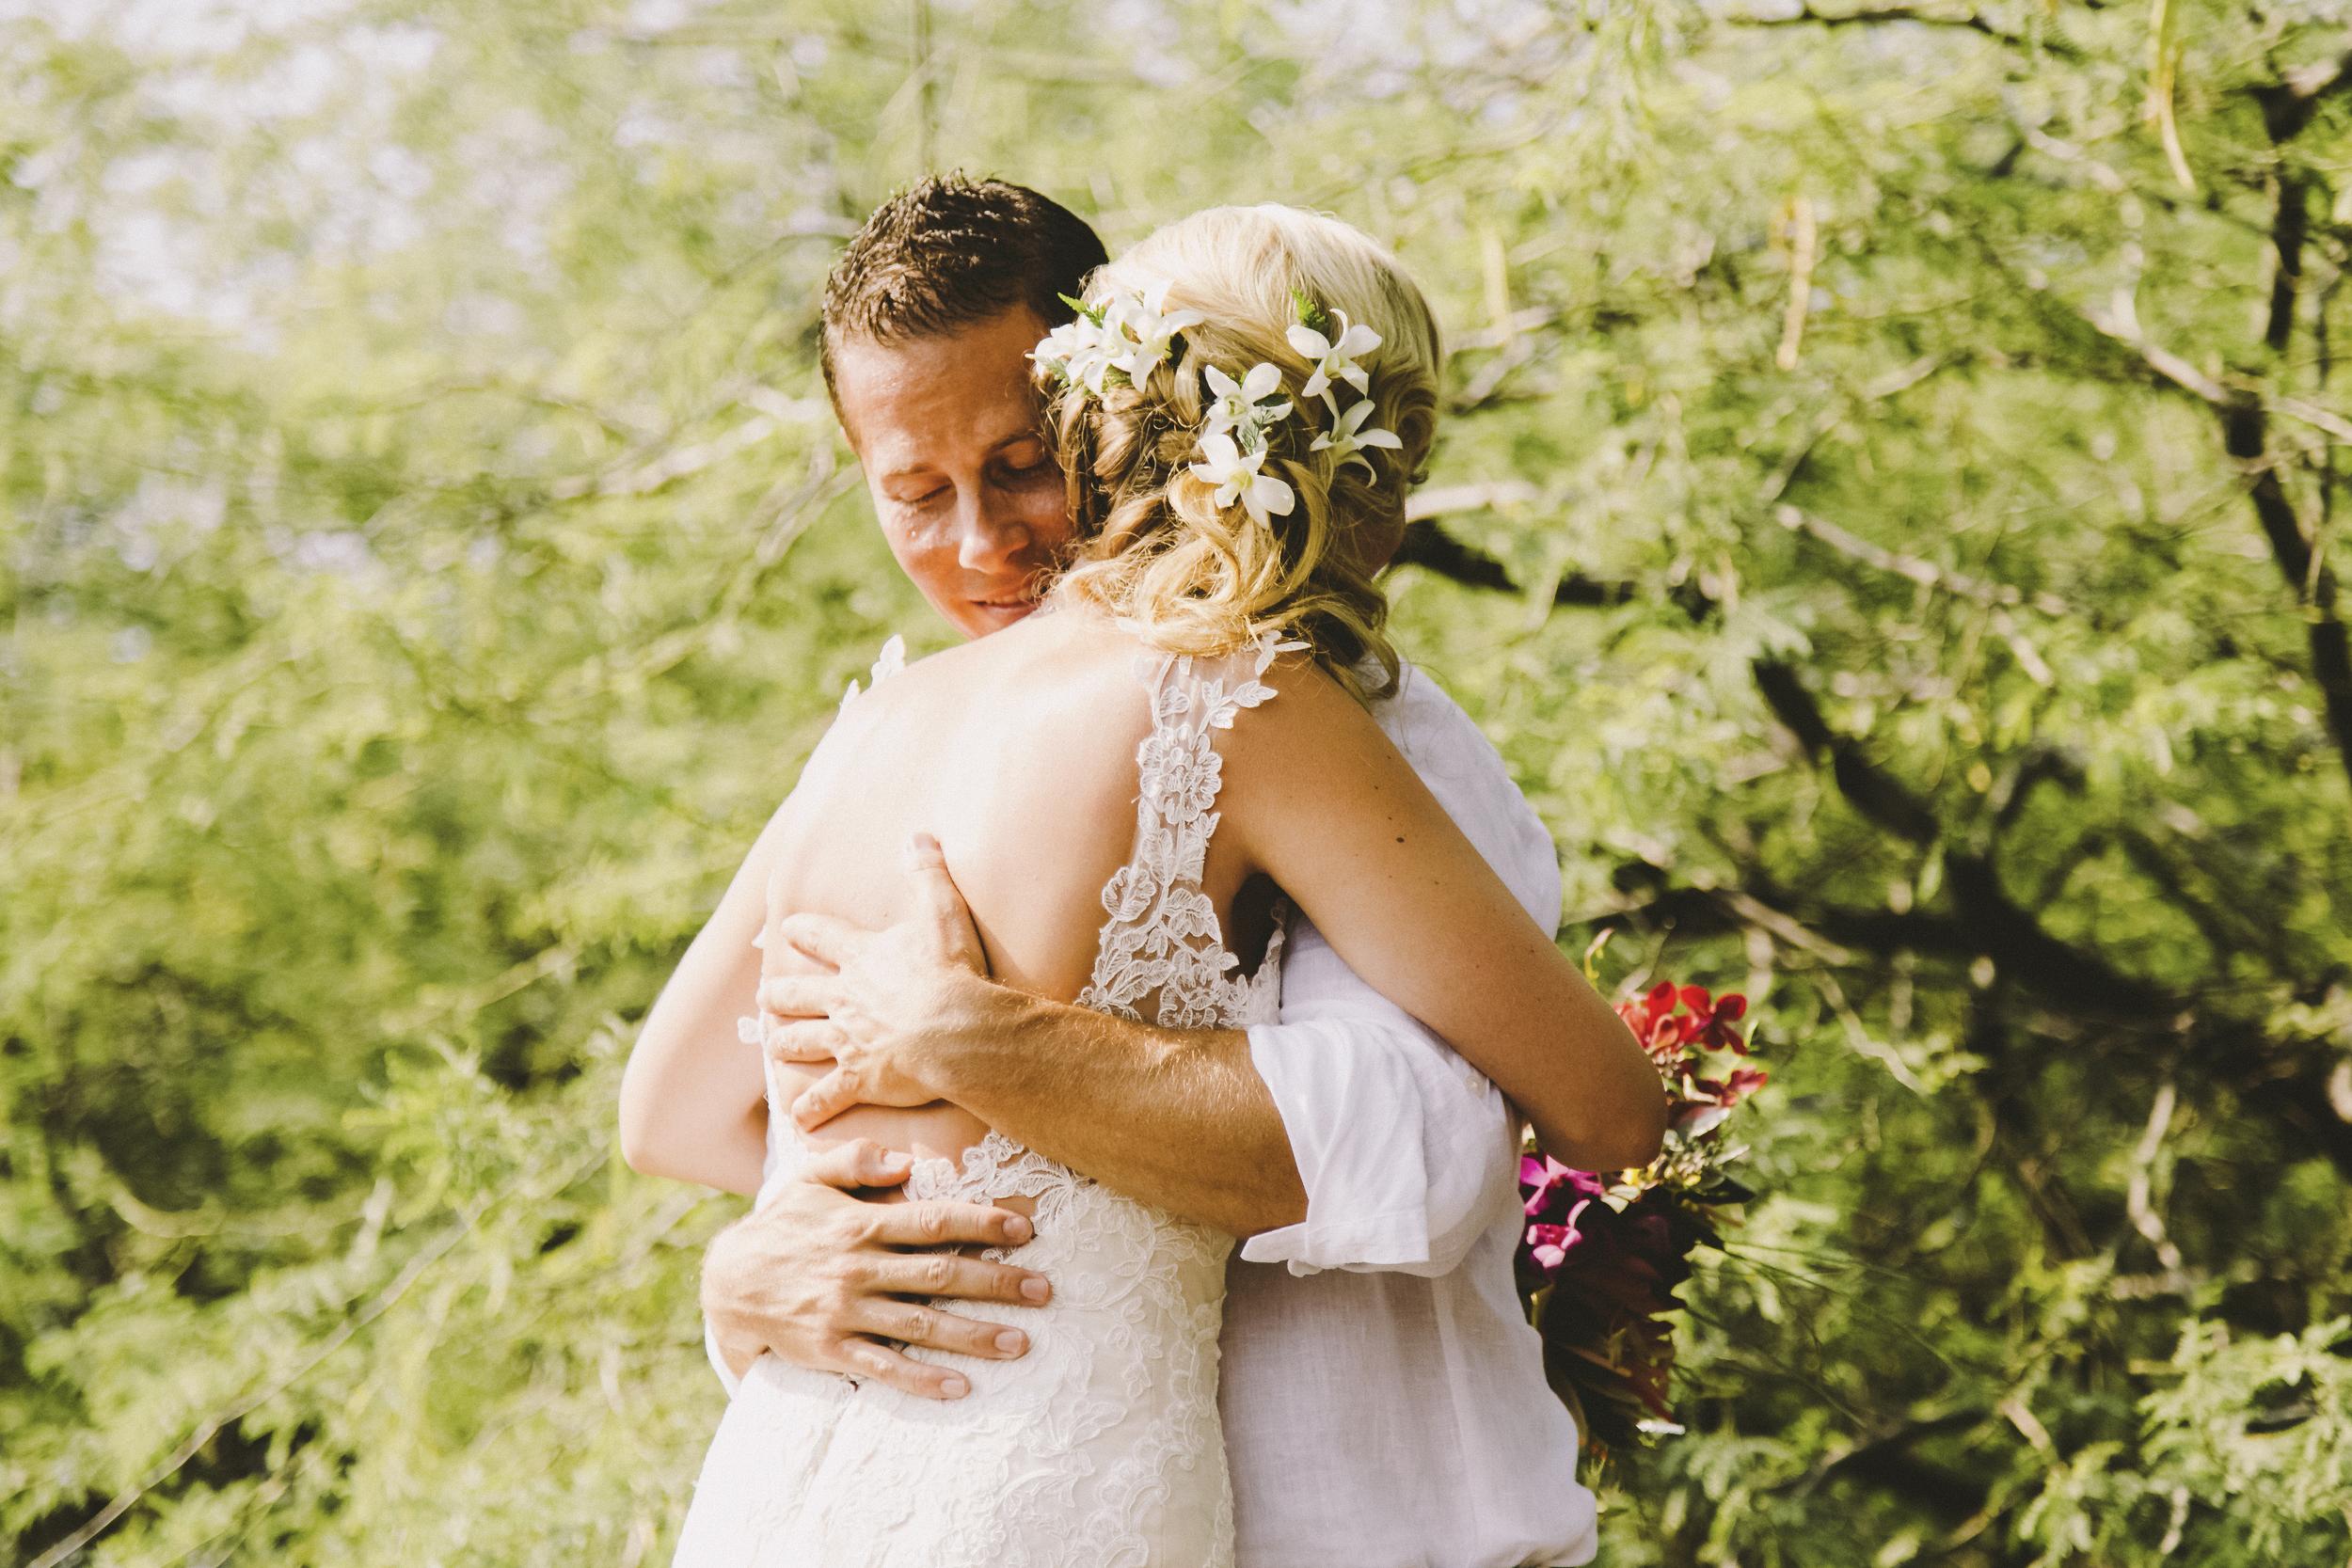 angie-diaz-photography-hawaii-wedding-photographer-kelli-jay-31.jpg